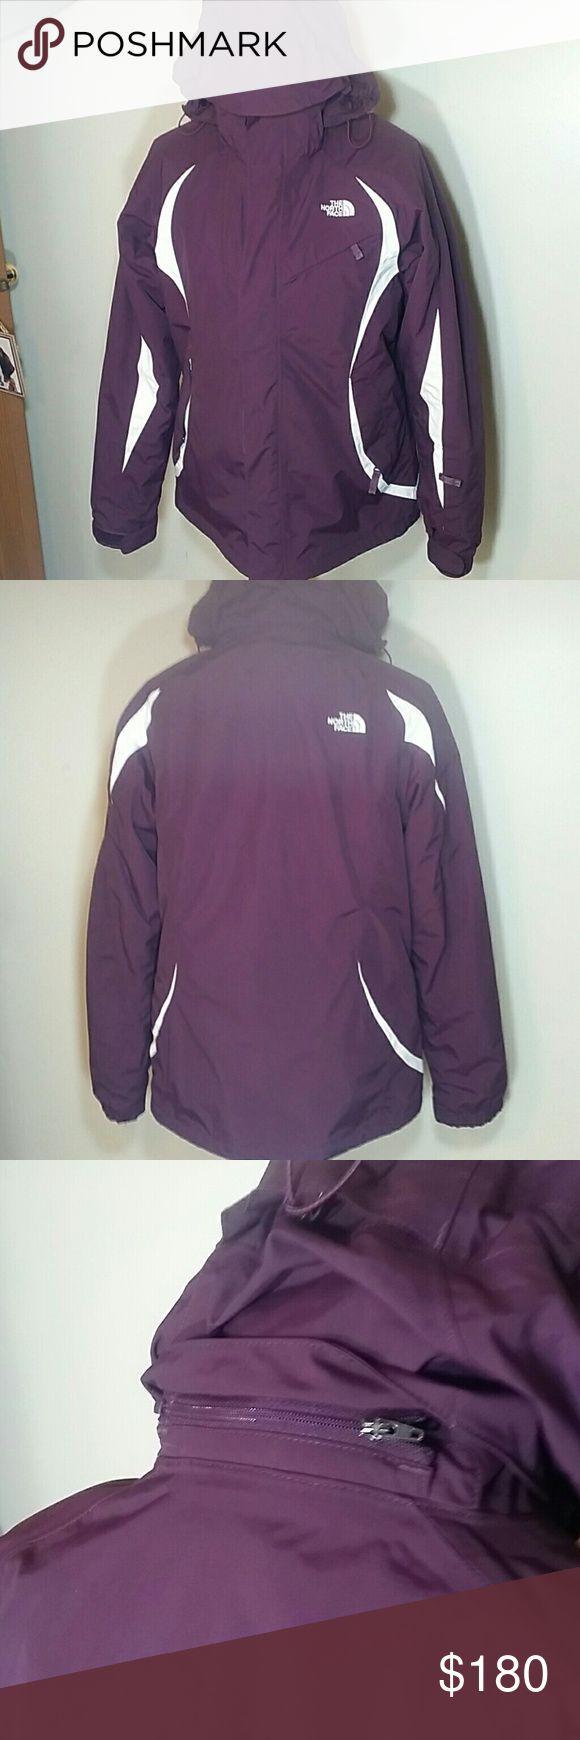 NORTH FACE PLUM 3 IN 1 COAT North Face Plum 3 in 1 coat North Face Jackets & Coats